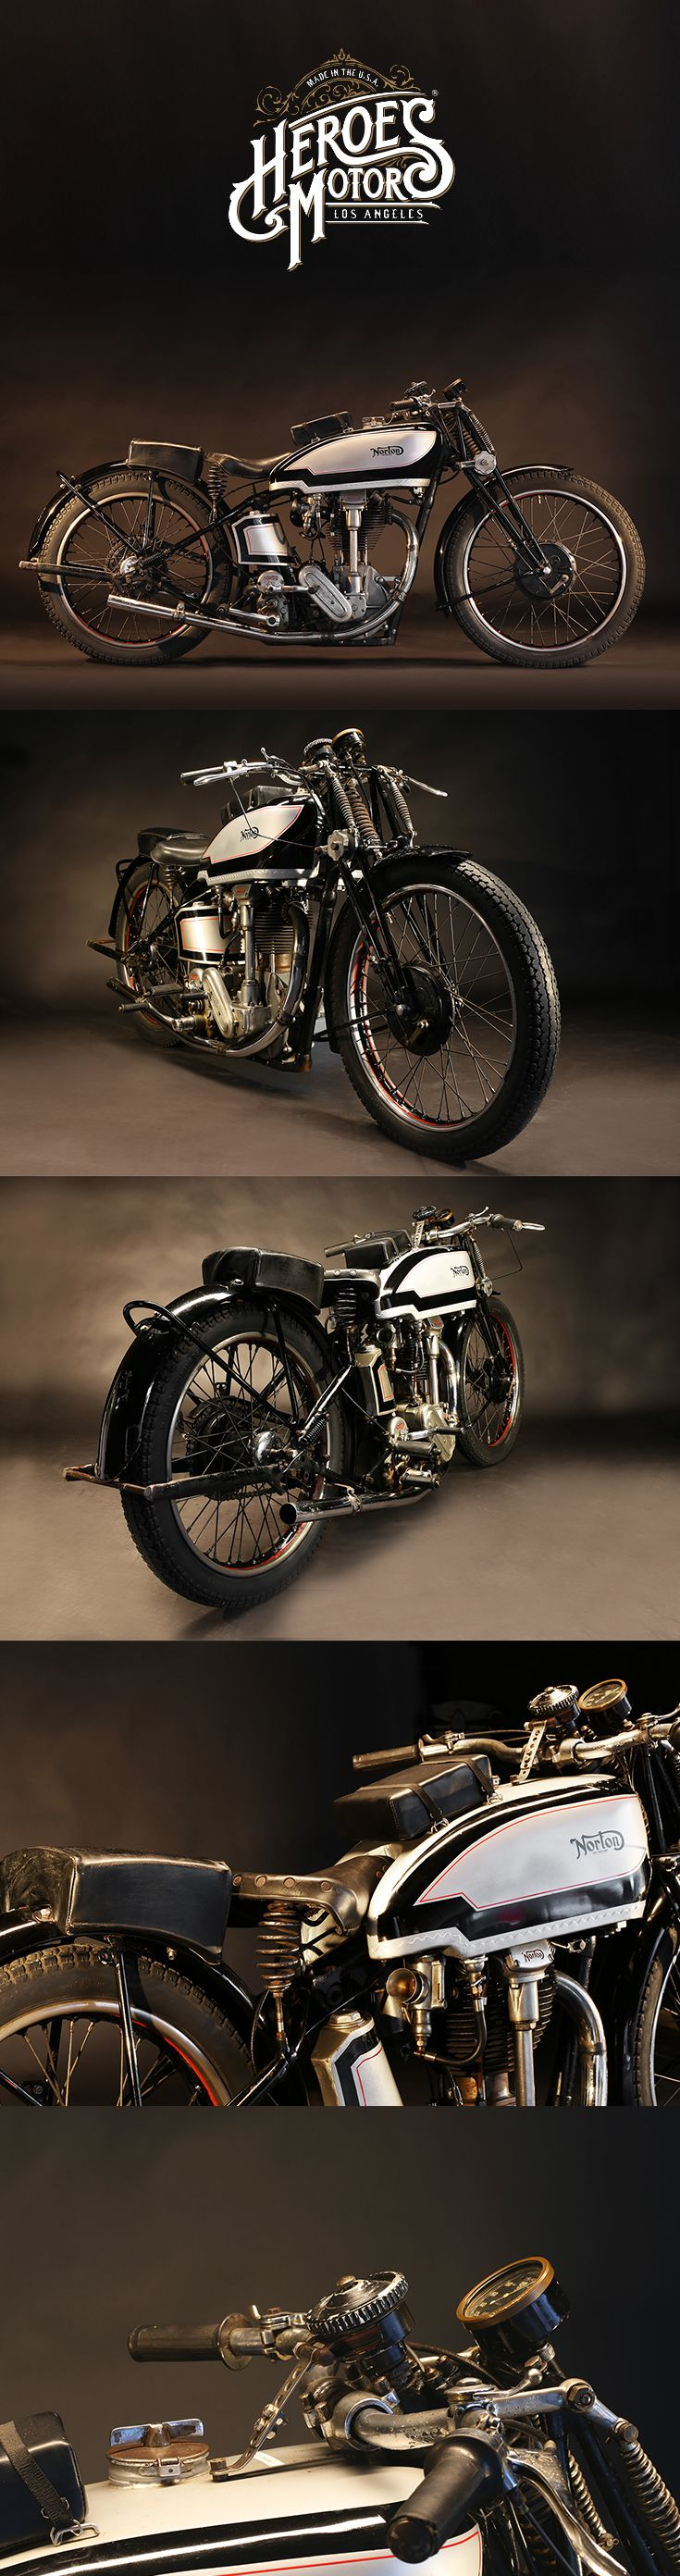 1937 NORTON 500cc MANX